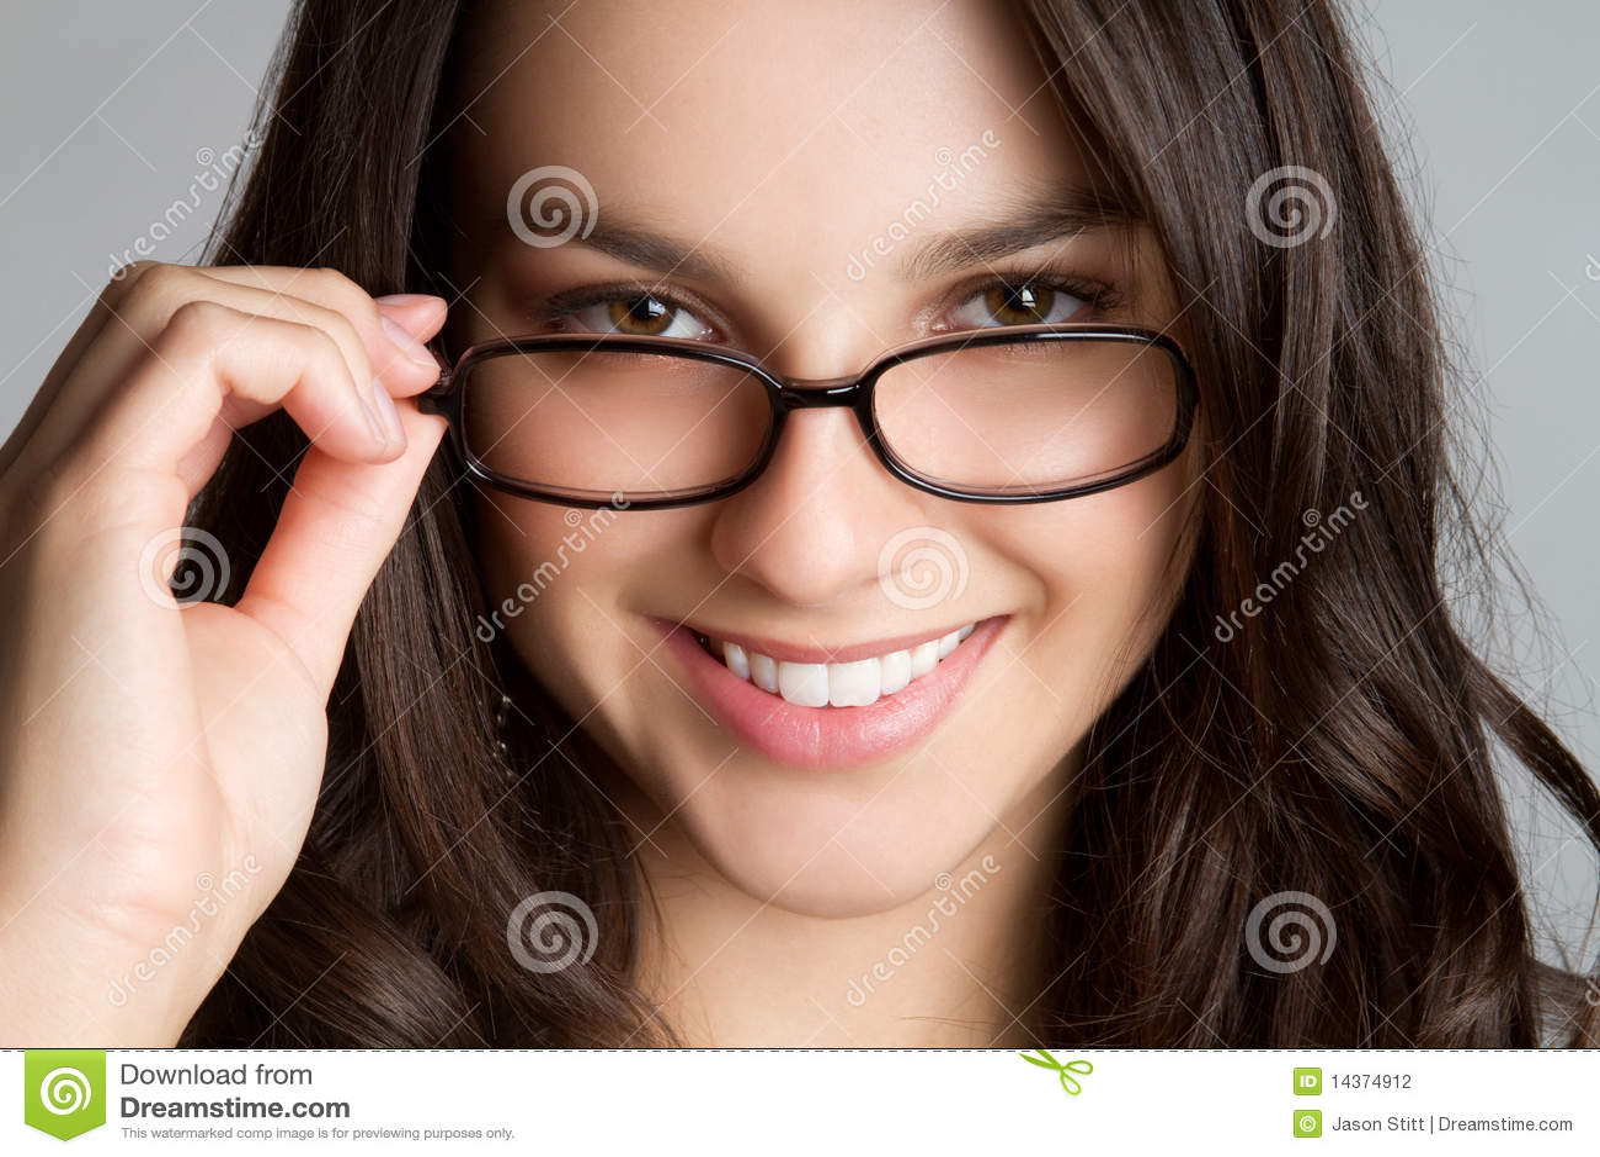 Girls glasses Nude Photos 66